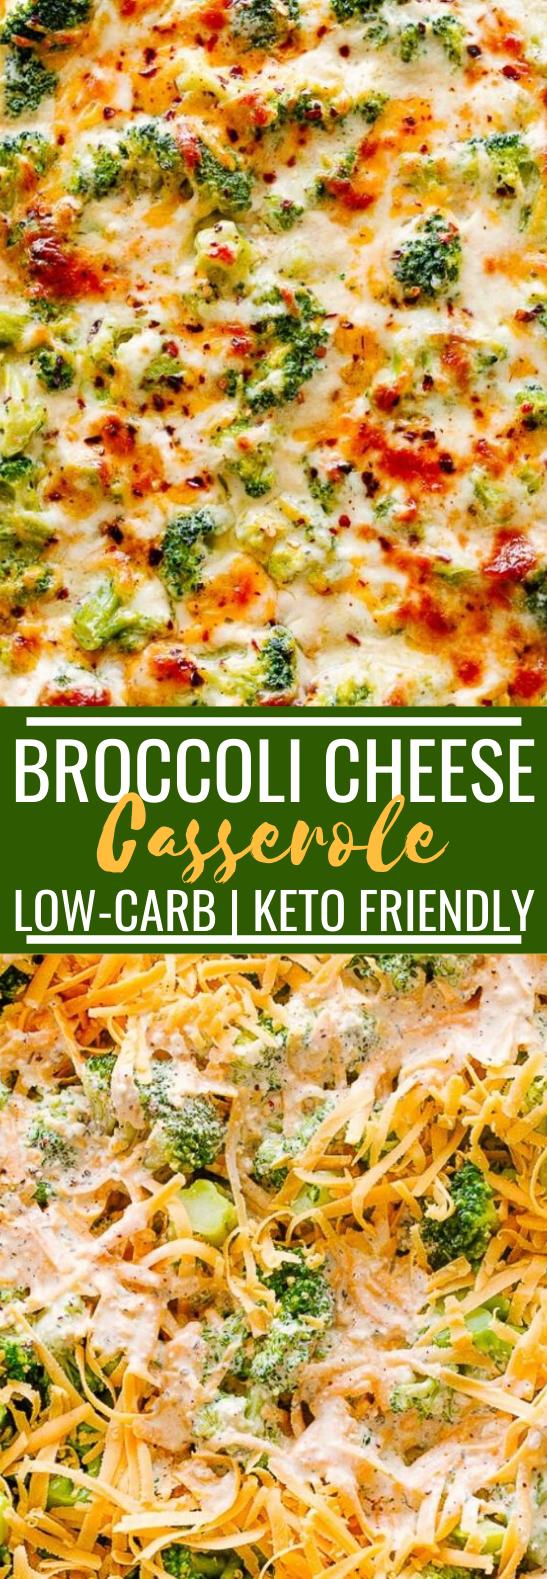 Broccoli Cheese Casserole #lowcarb #dinner #keto #recipes #casserole